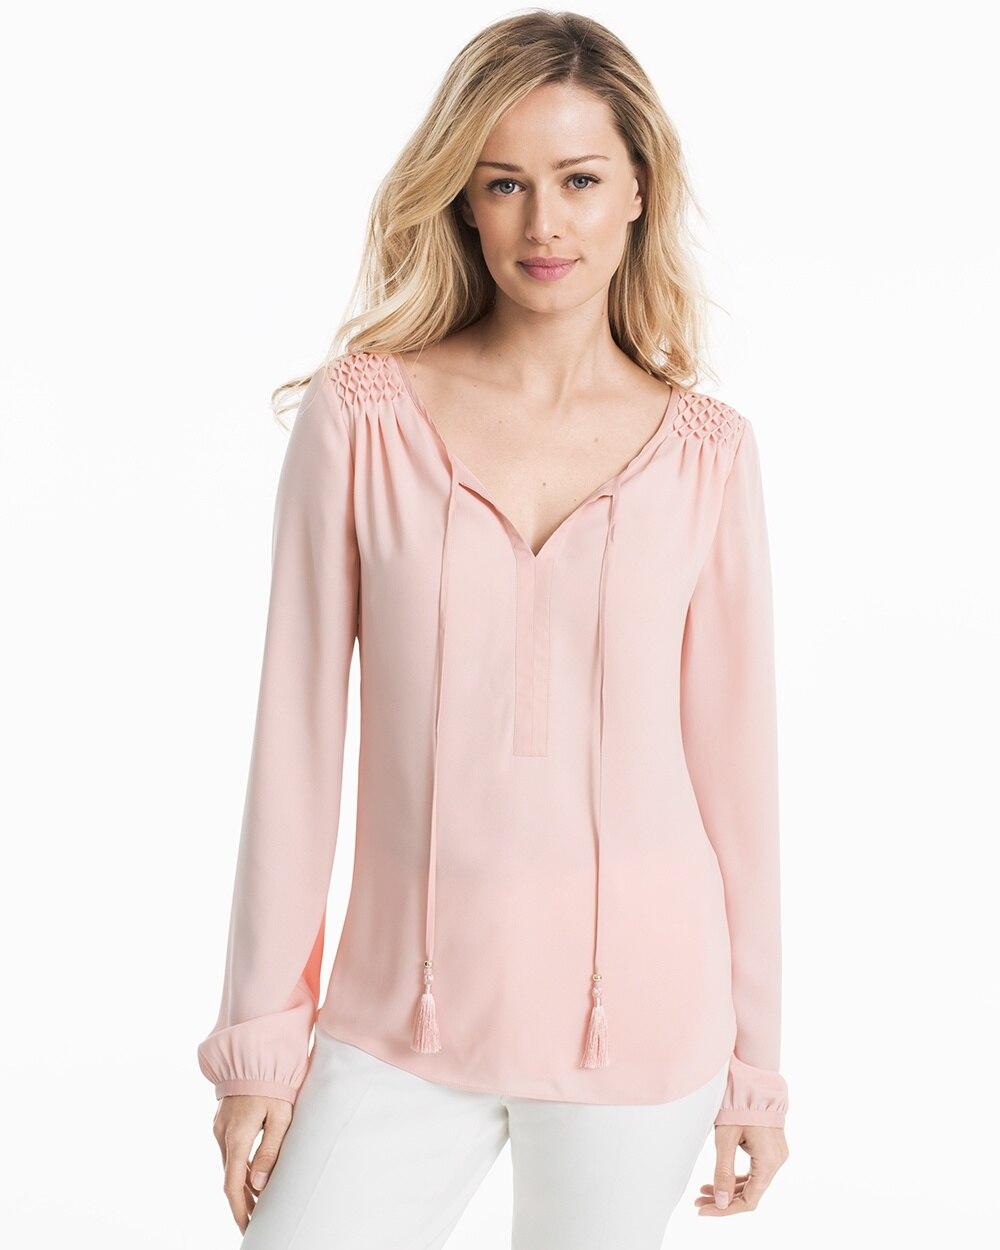 8e639349 Pink Peasant Blouse - White House Black Market